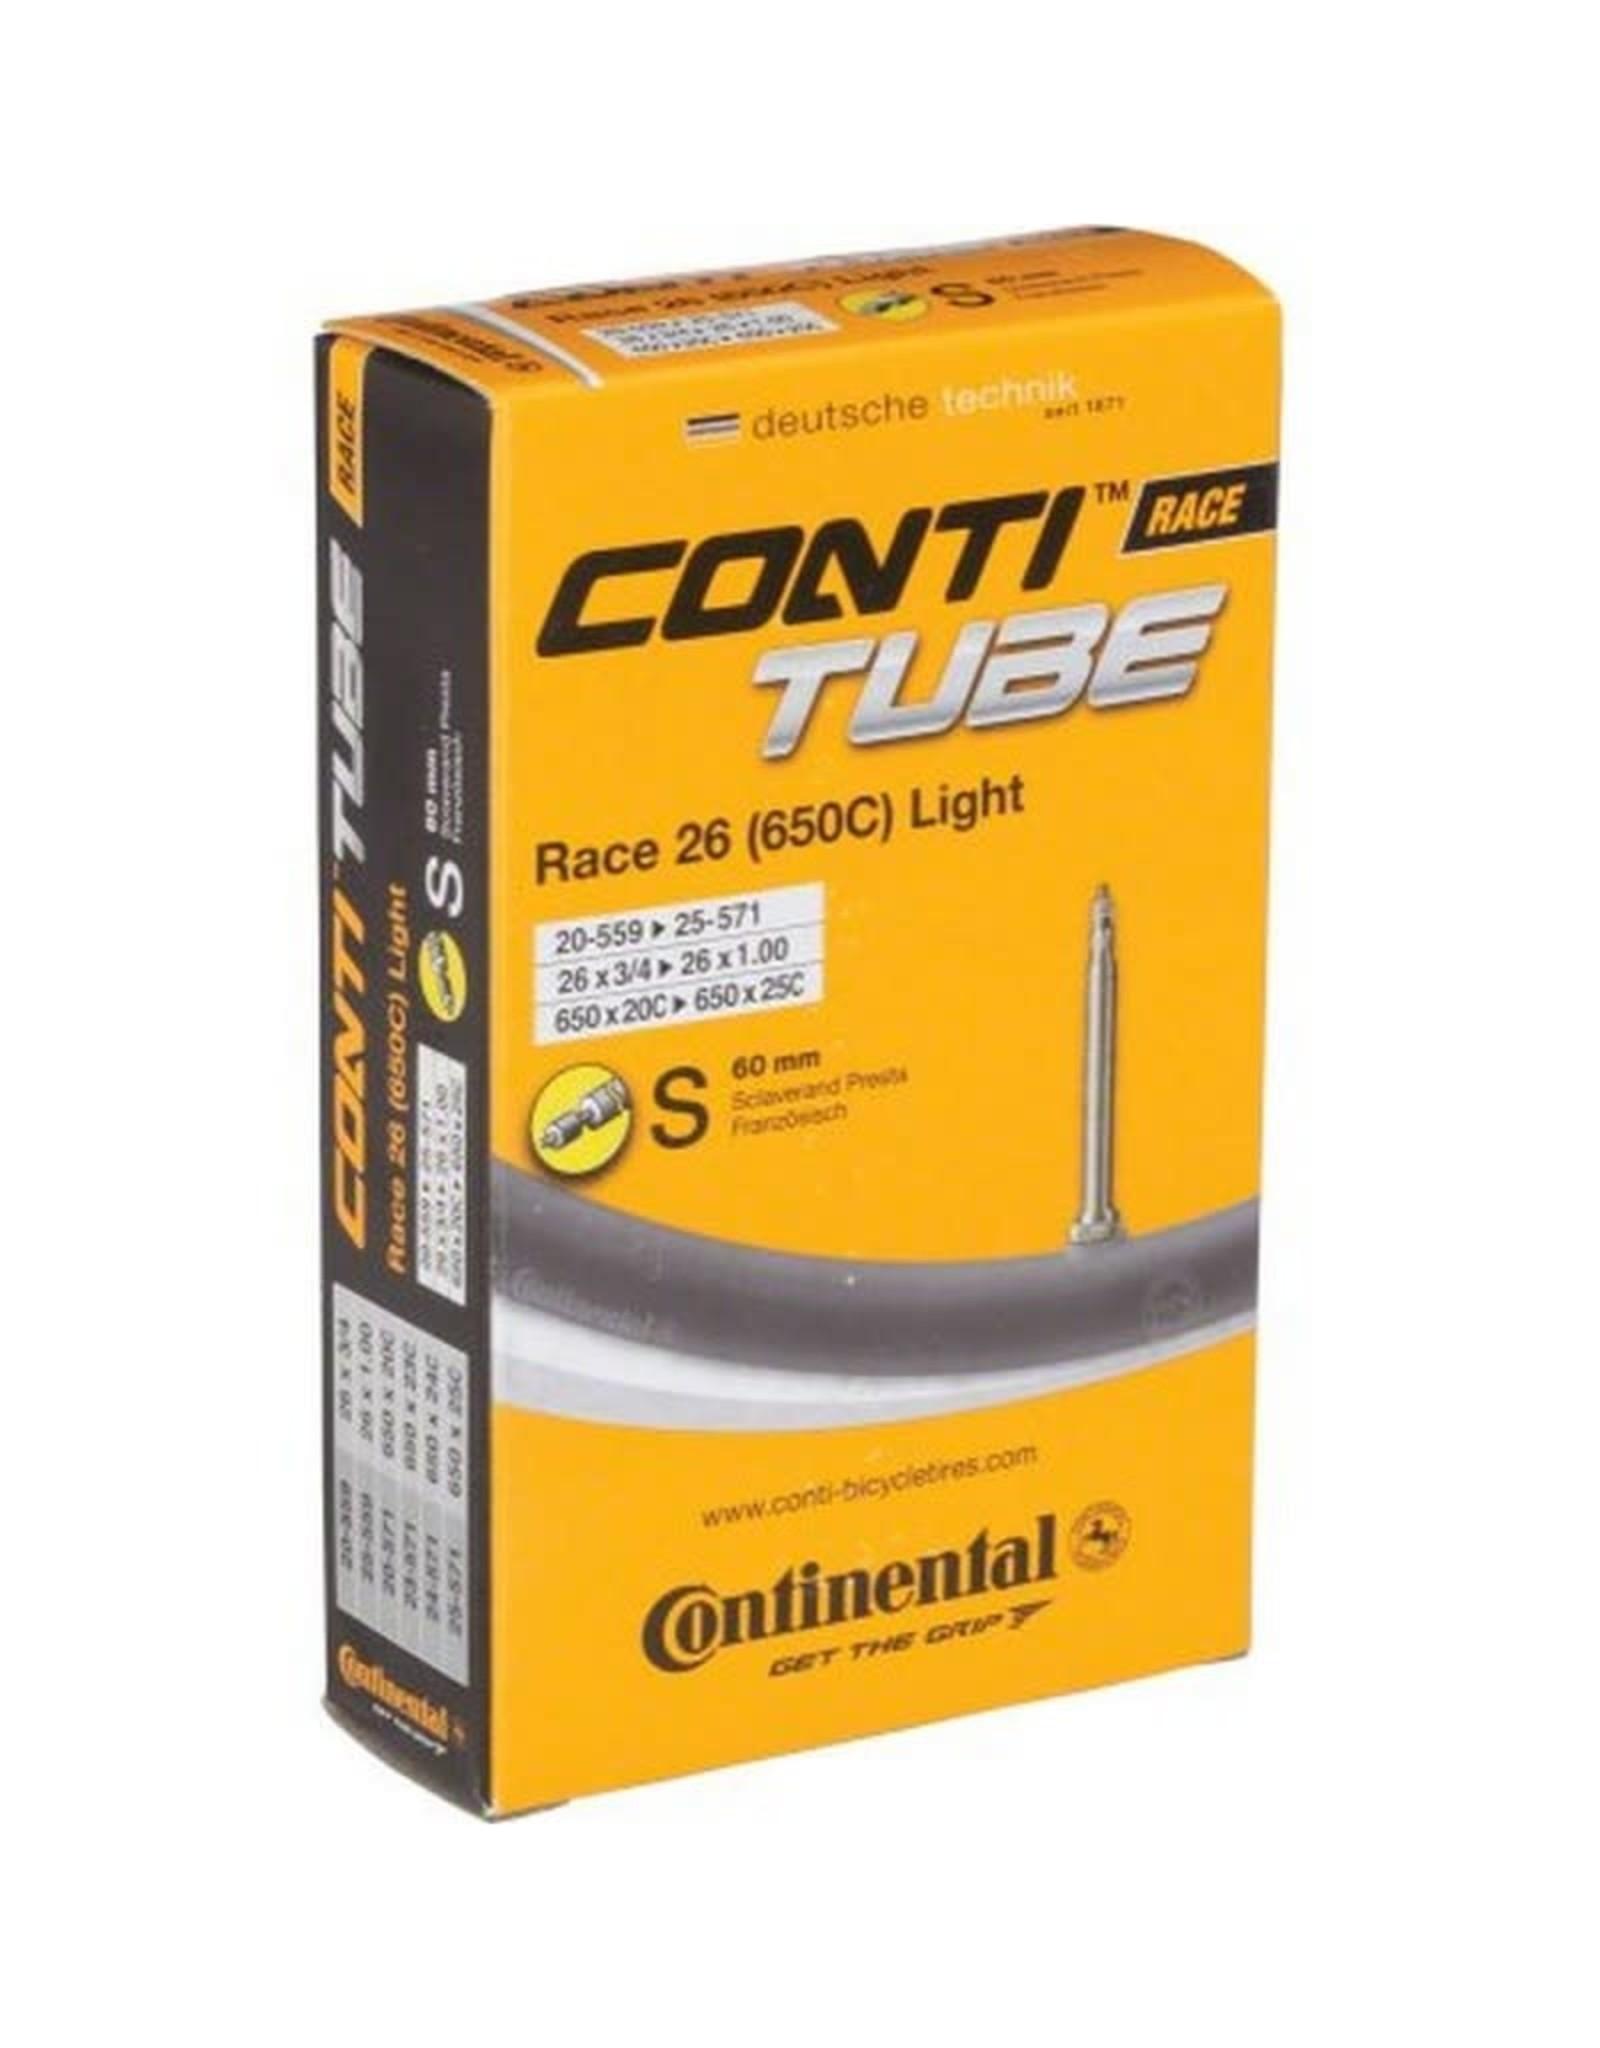 Continental Tube Continental 650 X 18-25 - PV 60mm Light - 70G